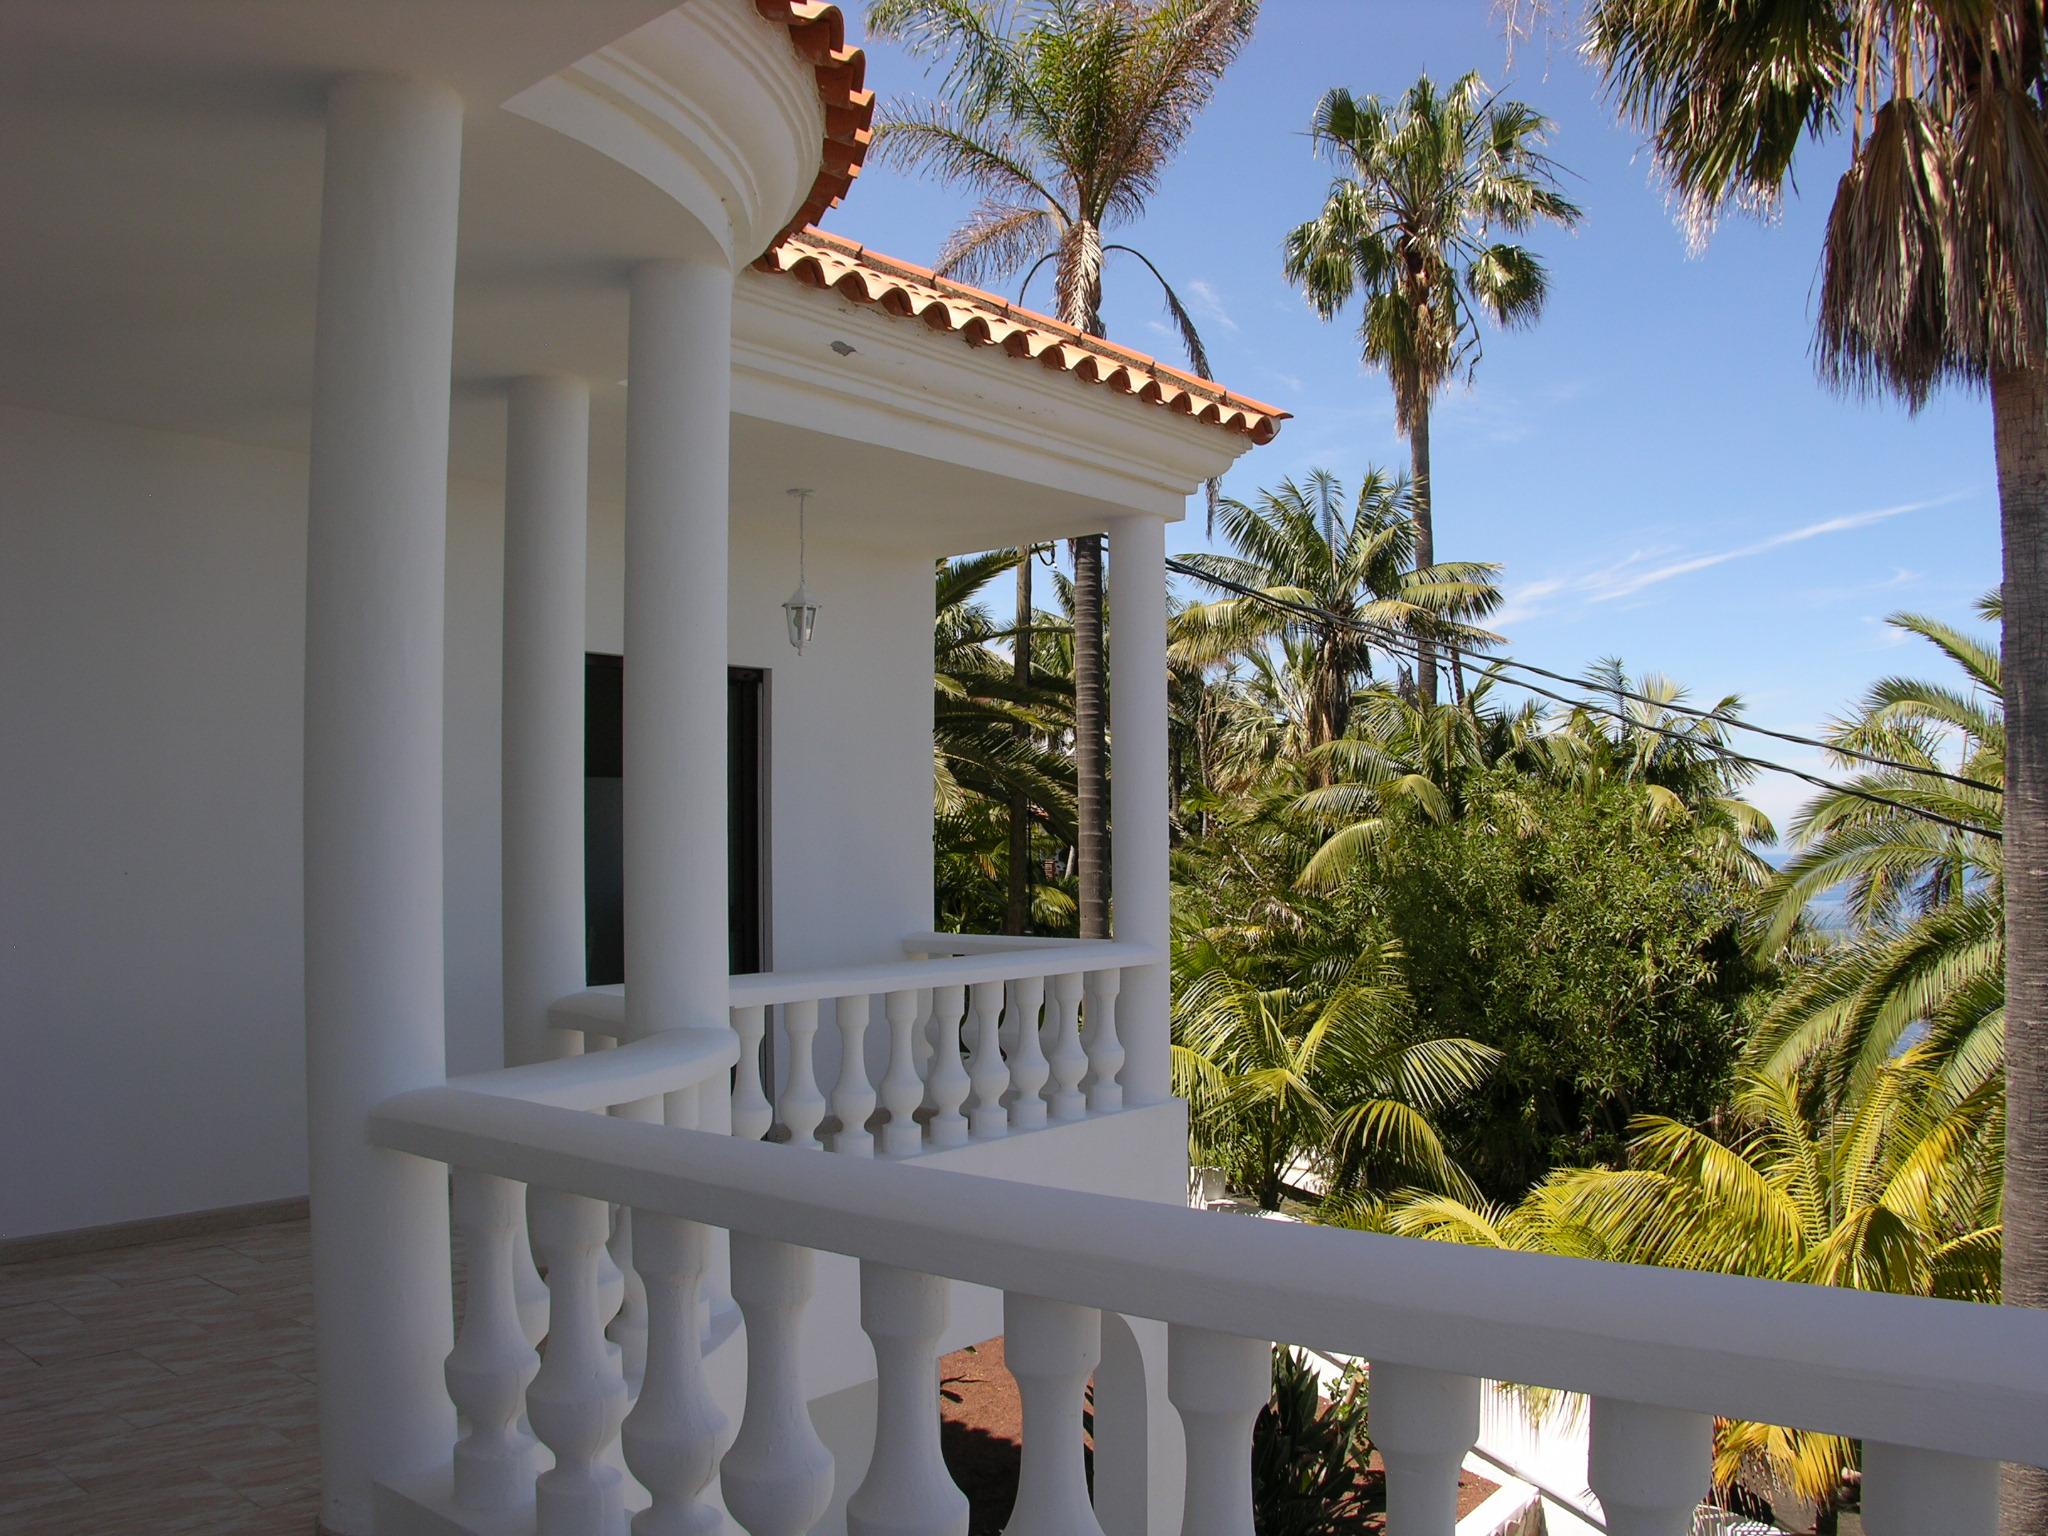 Maison de vacances Villa Vista La Quinta beheizbarer Pool kostenloses WLAN Grill (2124407), Santa Ursula, Ténérife, Iles Canaries, Espagne, image 5